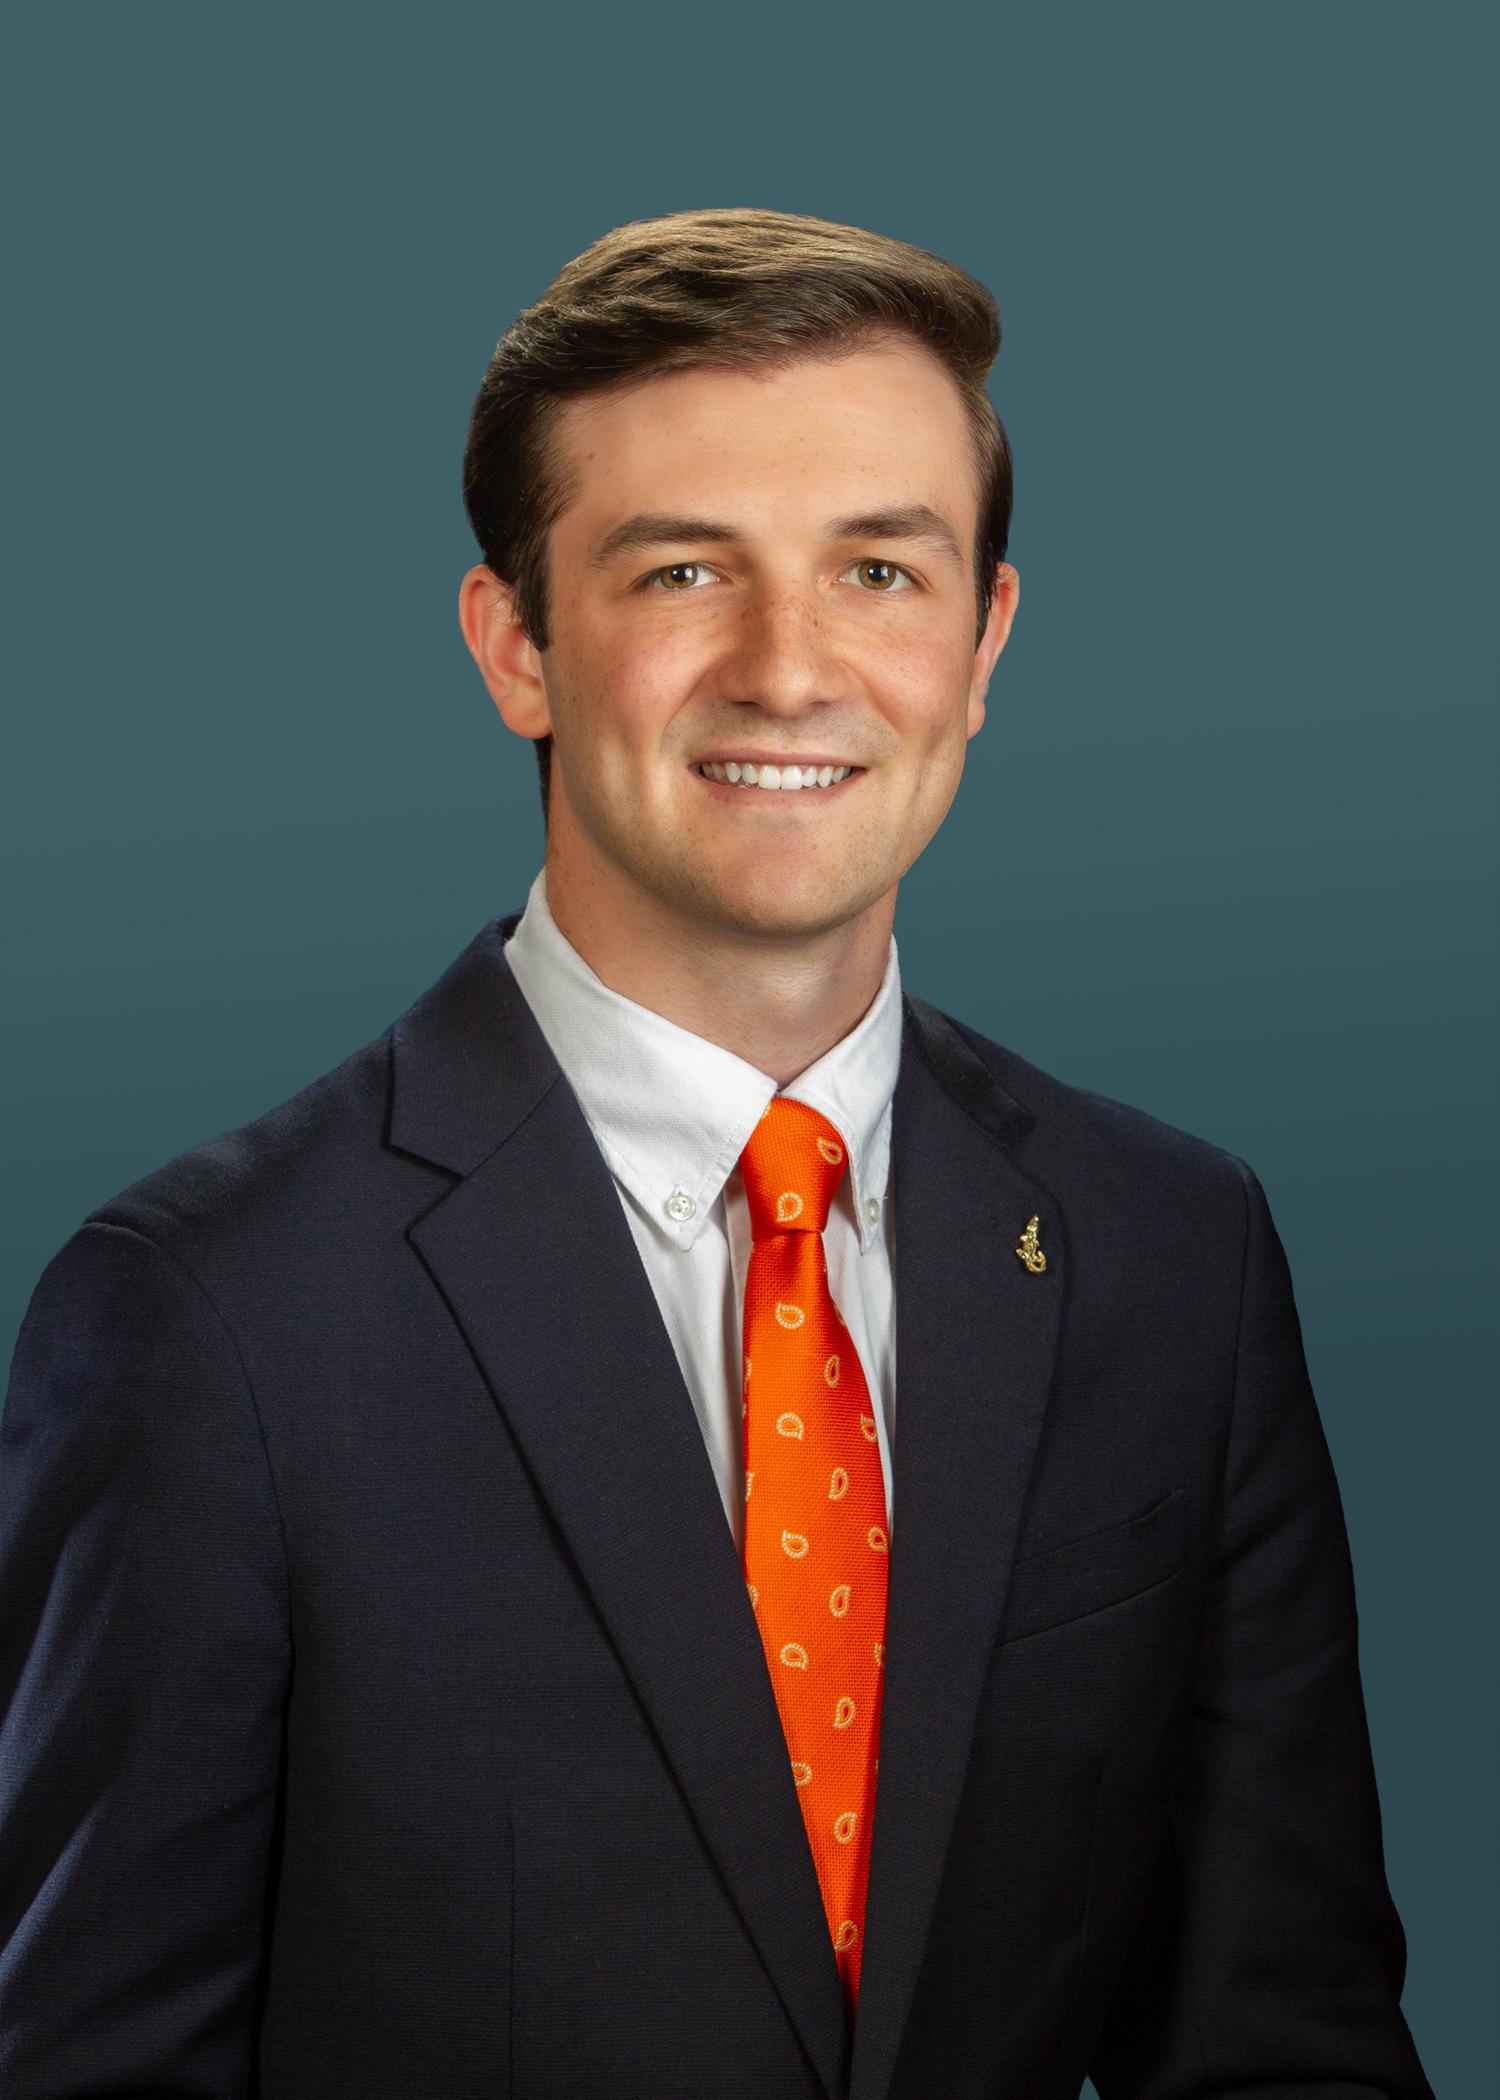 Cooper Brown